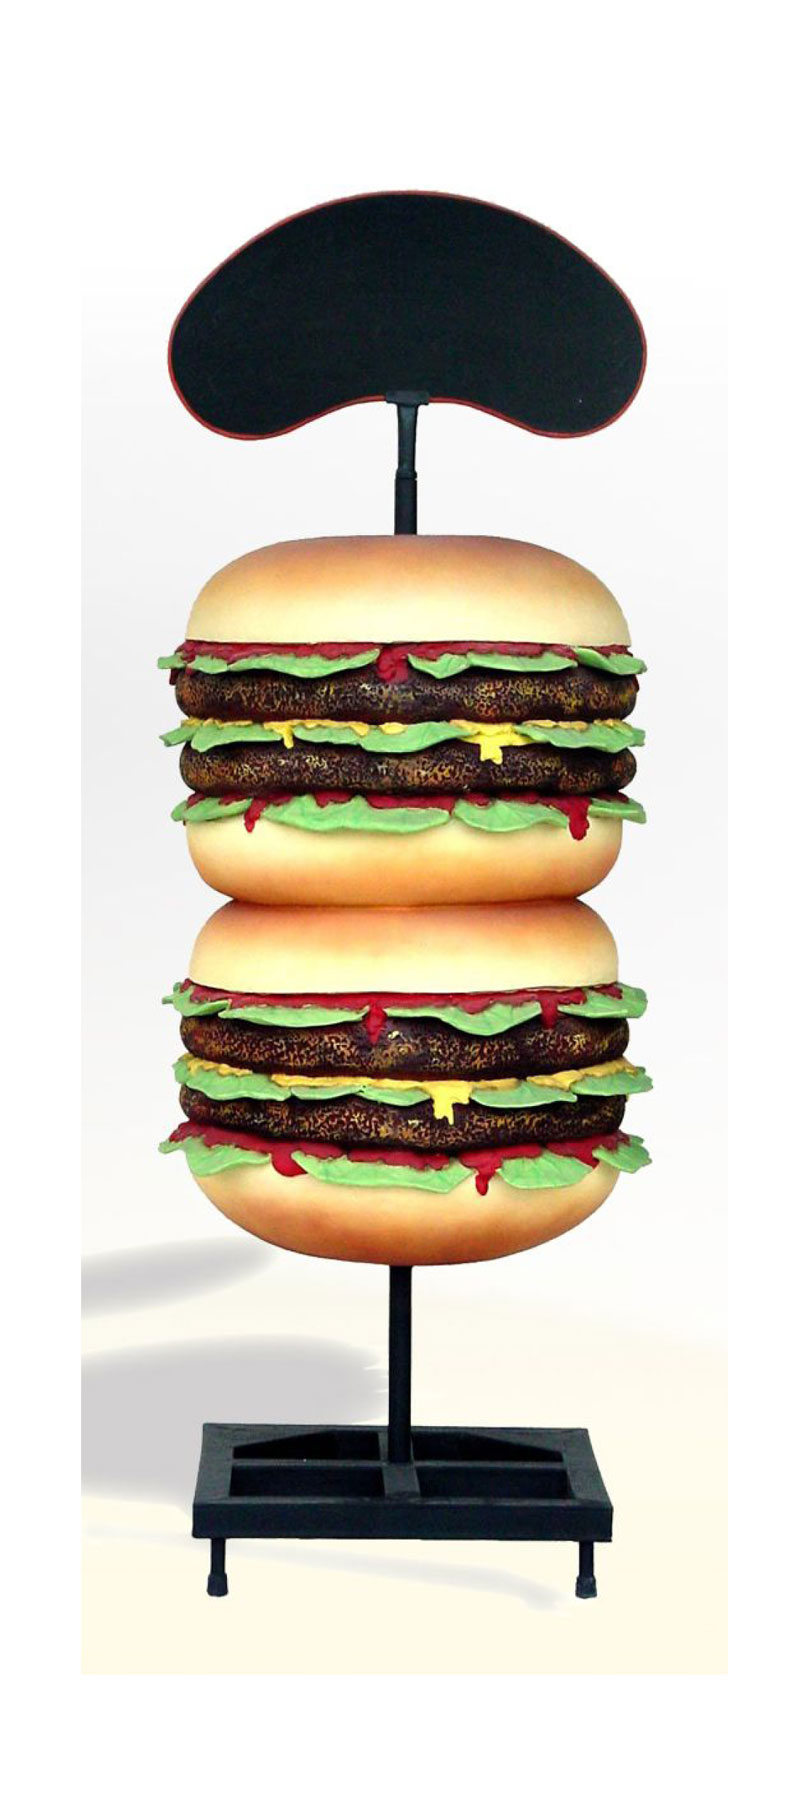 hamburgerfigura